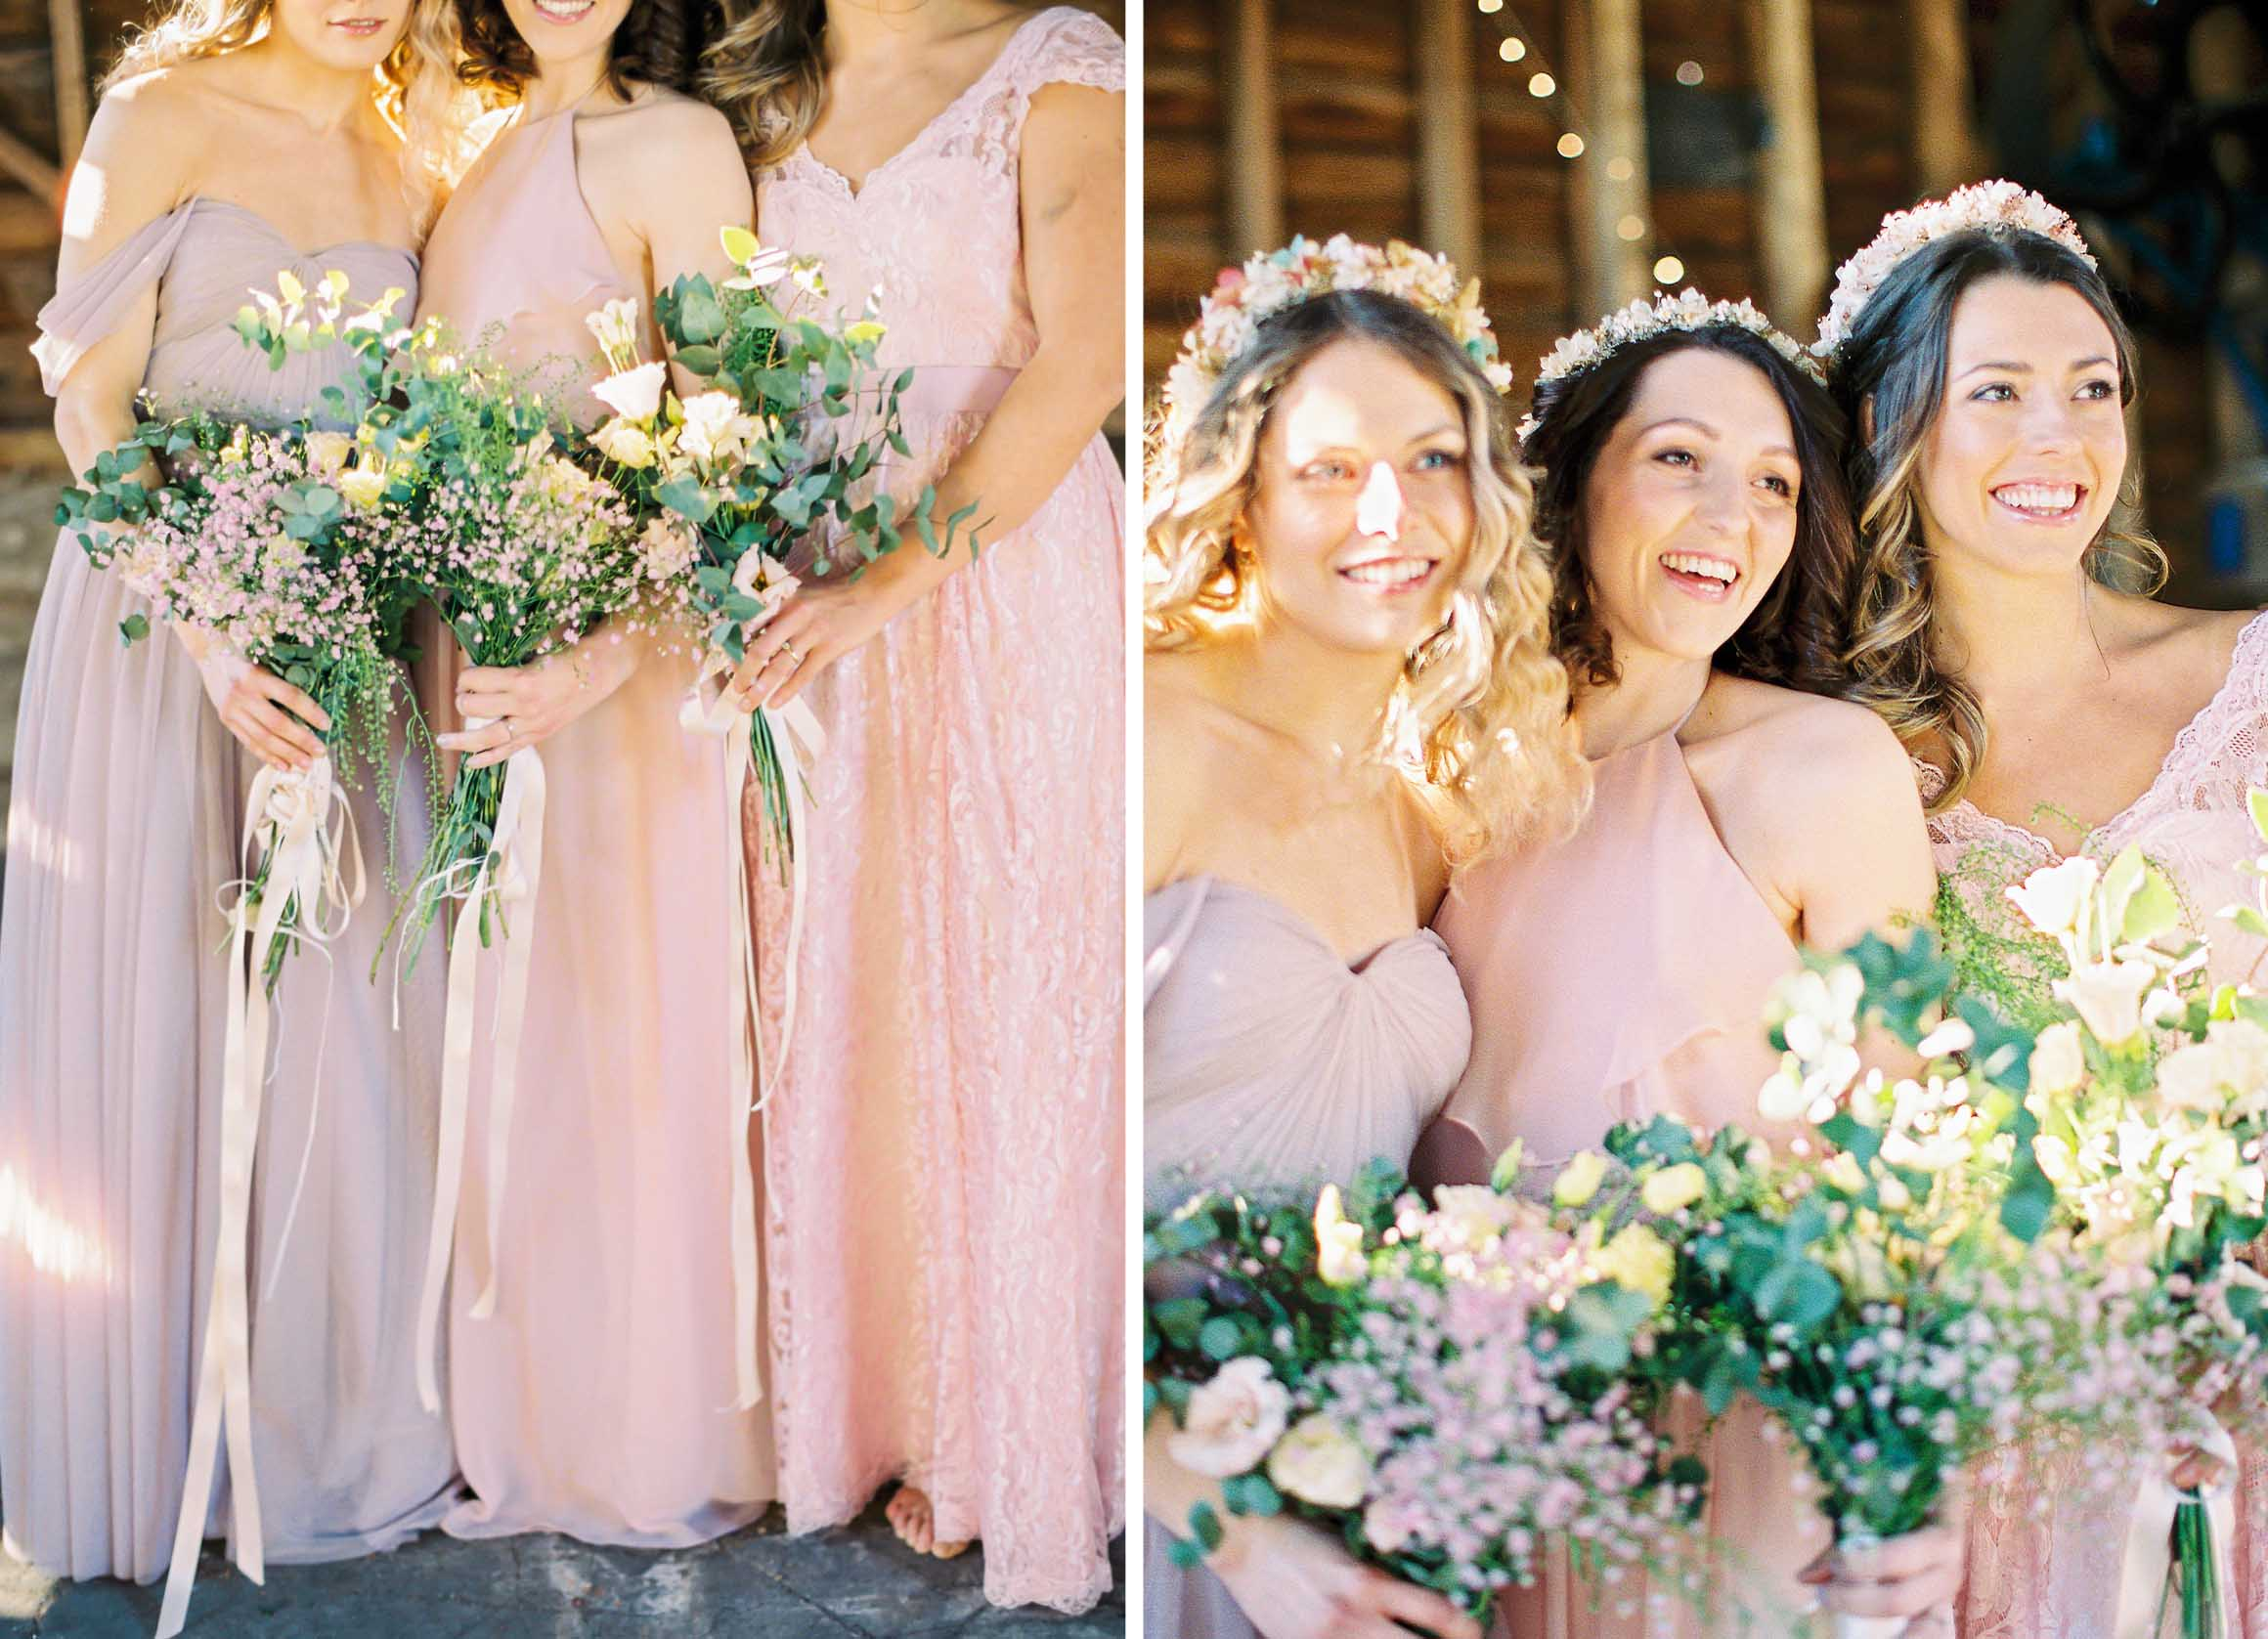 Amy O'Boyle Photography- Destination & UK Fine Art Film Wedding Photographer- TH&TH Bridesmaid Dress Shoot 9.jpg